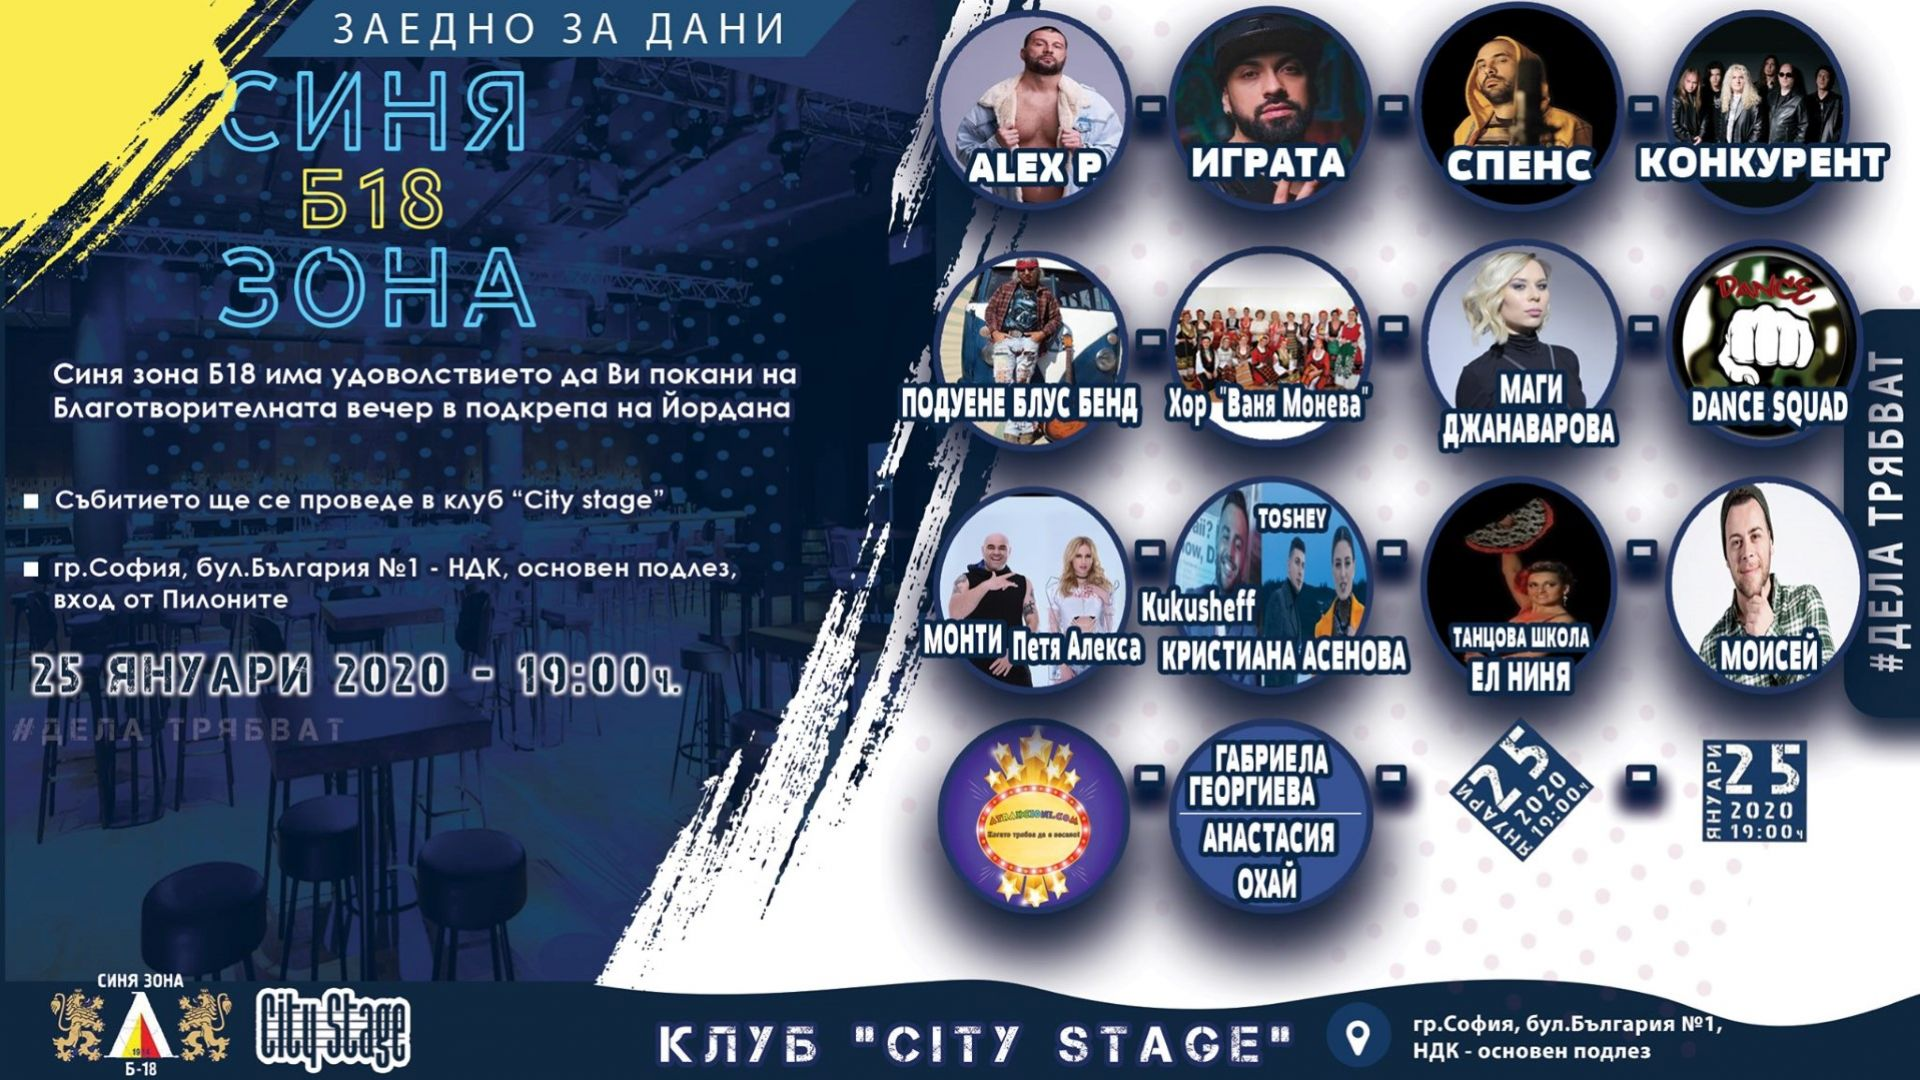 Музикални звезди и спортисти на Левски в благотворителна вечер за болно дете